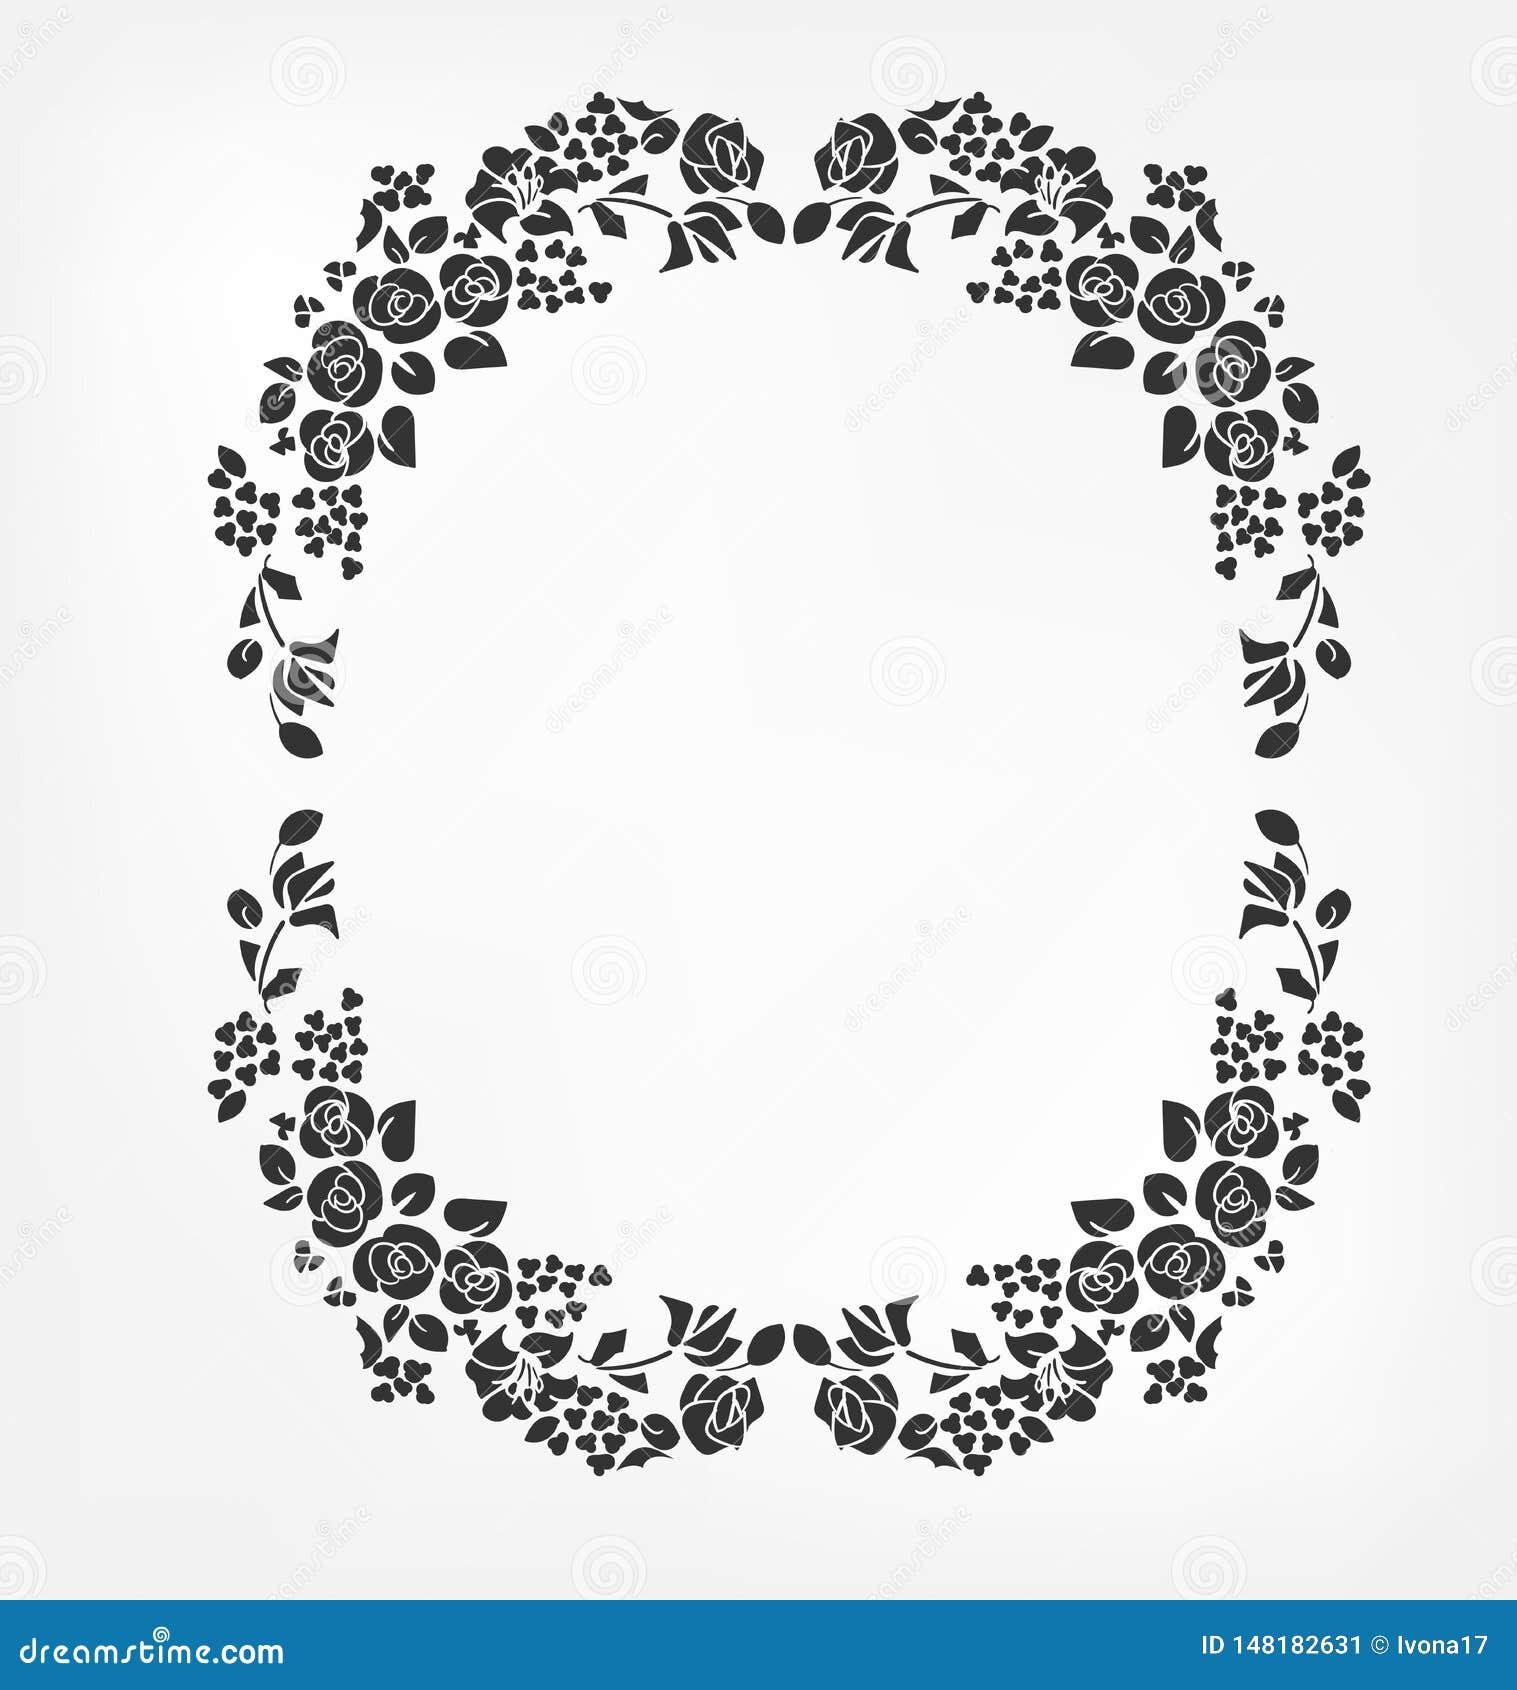 Vektor Victorian, den barocke Gestaltungselemente blühen, stieg Flammenkreis ellipce